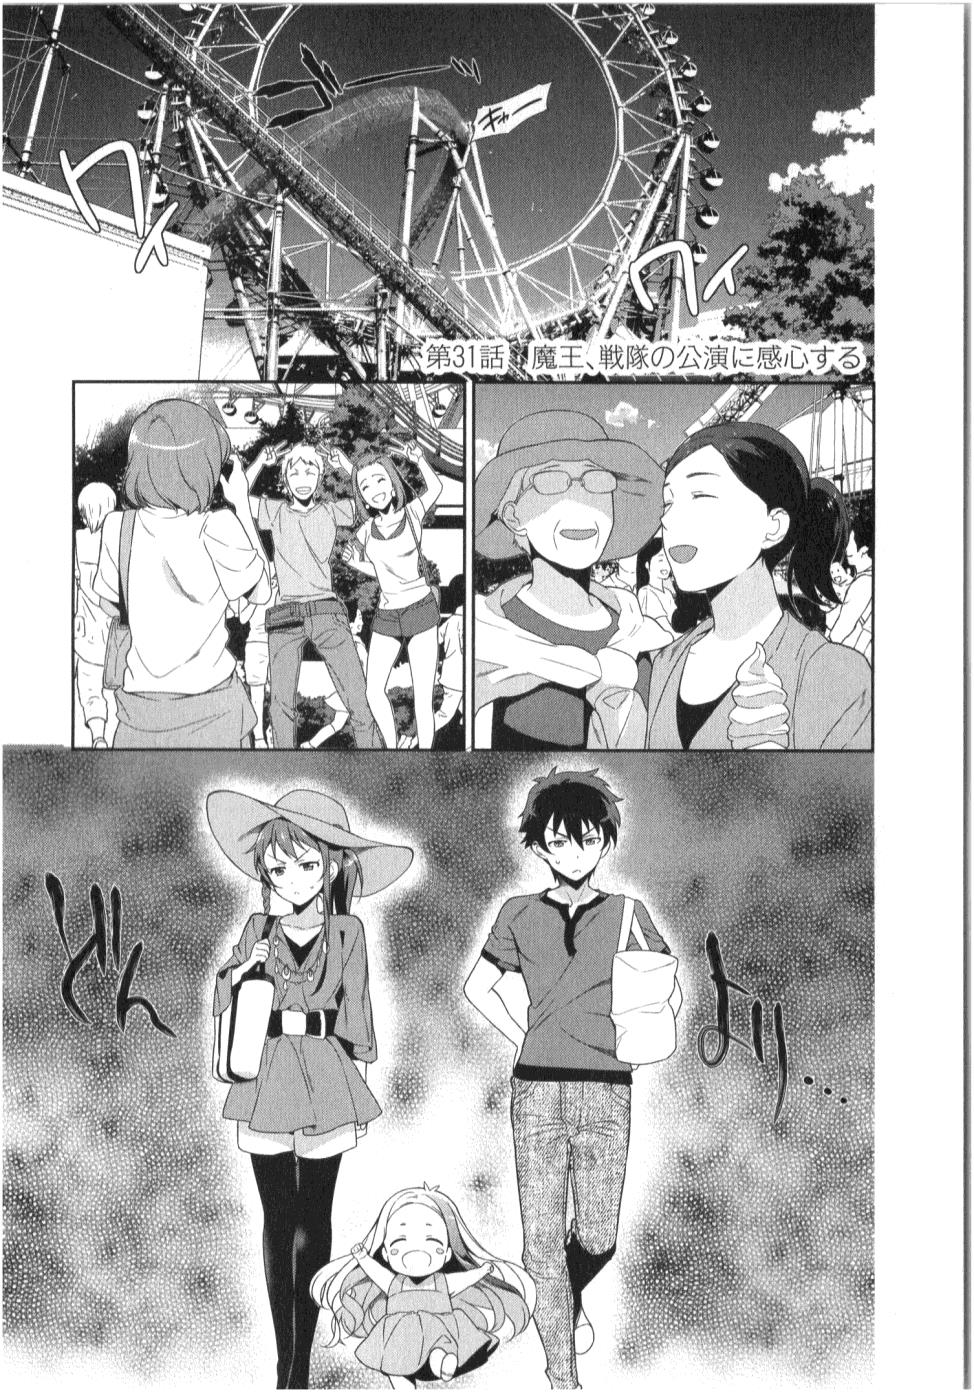 baca komik hataraku maou-sama chapter 31 bahasa indonesia